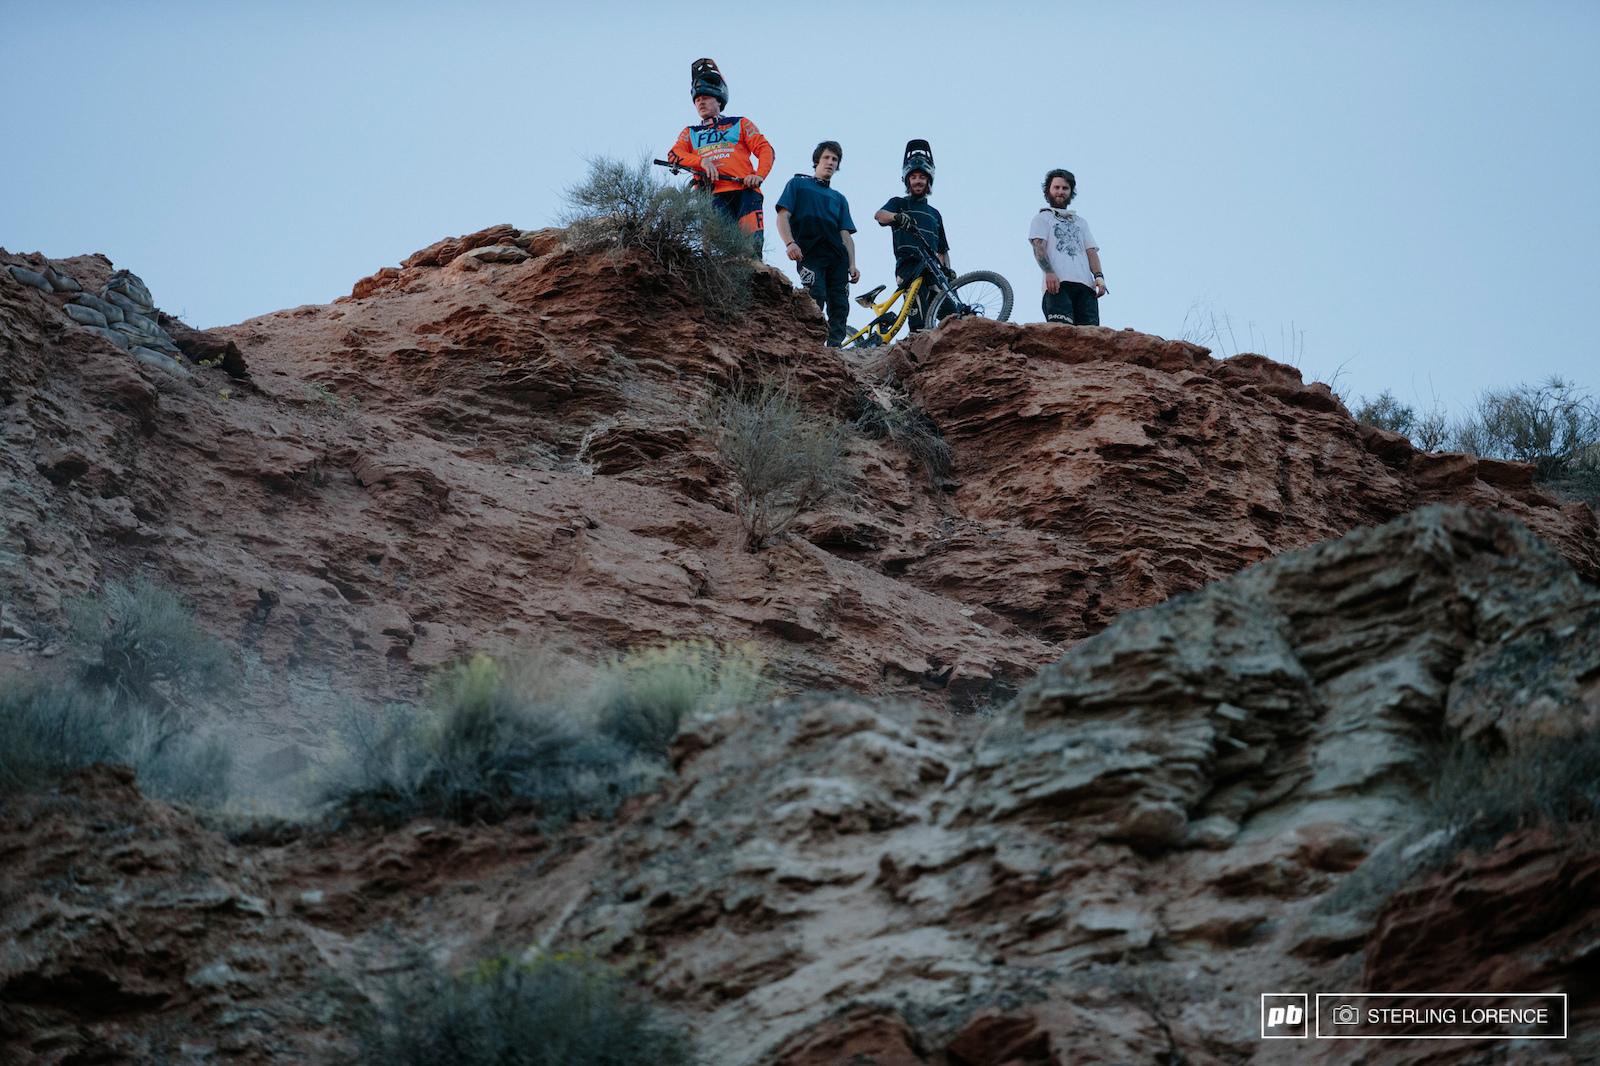 Lyle Brandon Sorge and Aggy at 2015 RedBull Rampage Virgin Utah USA